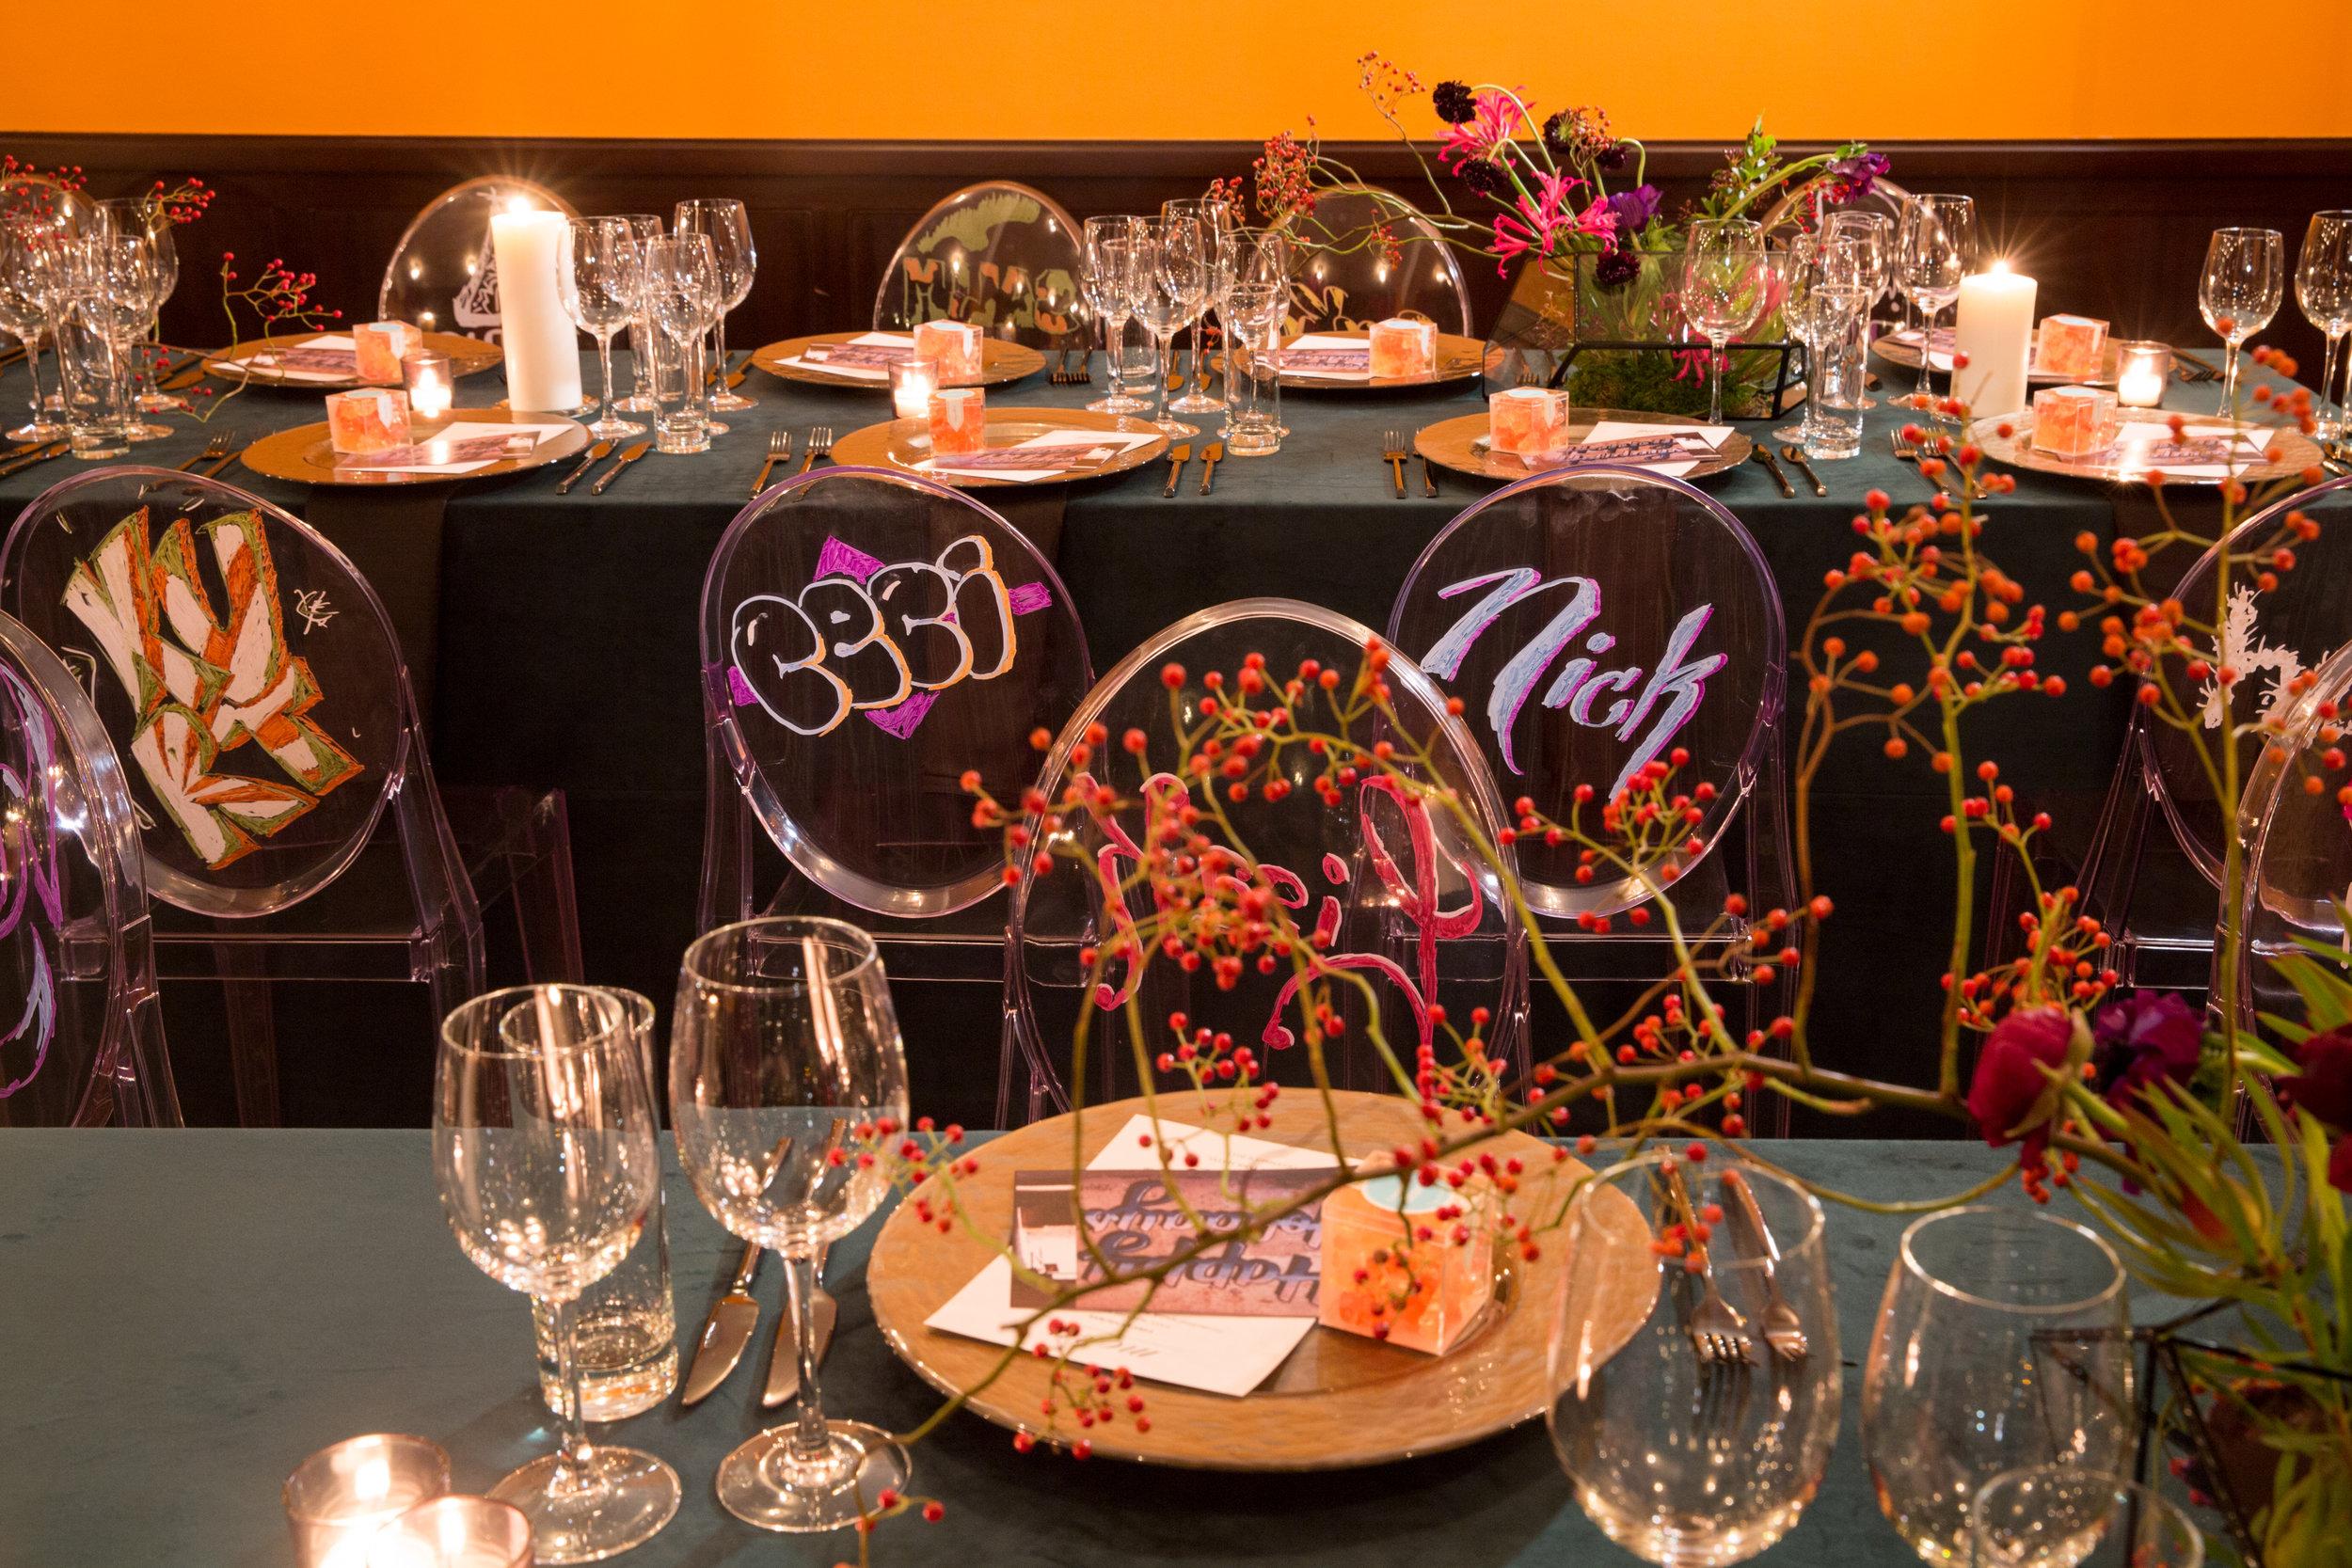 Gramercy-Park-Hotel-Holiday-Party-Andrea-Freeman-Events-8.JPG